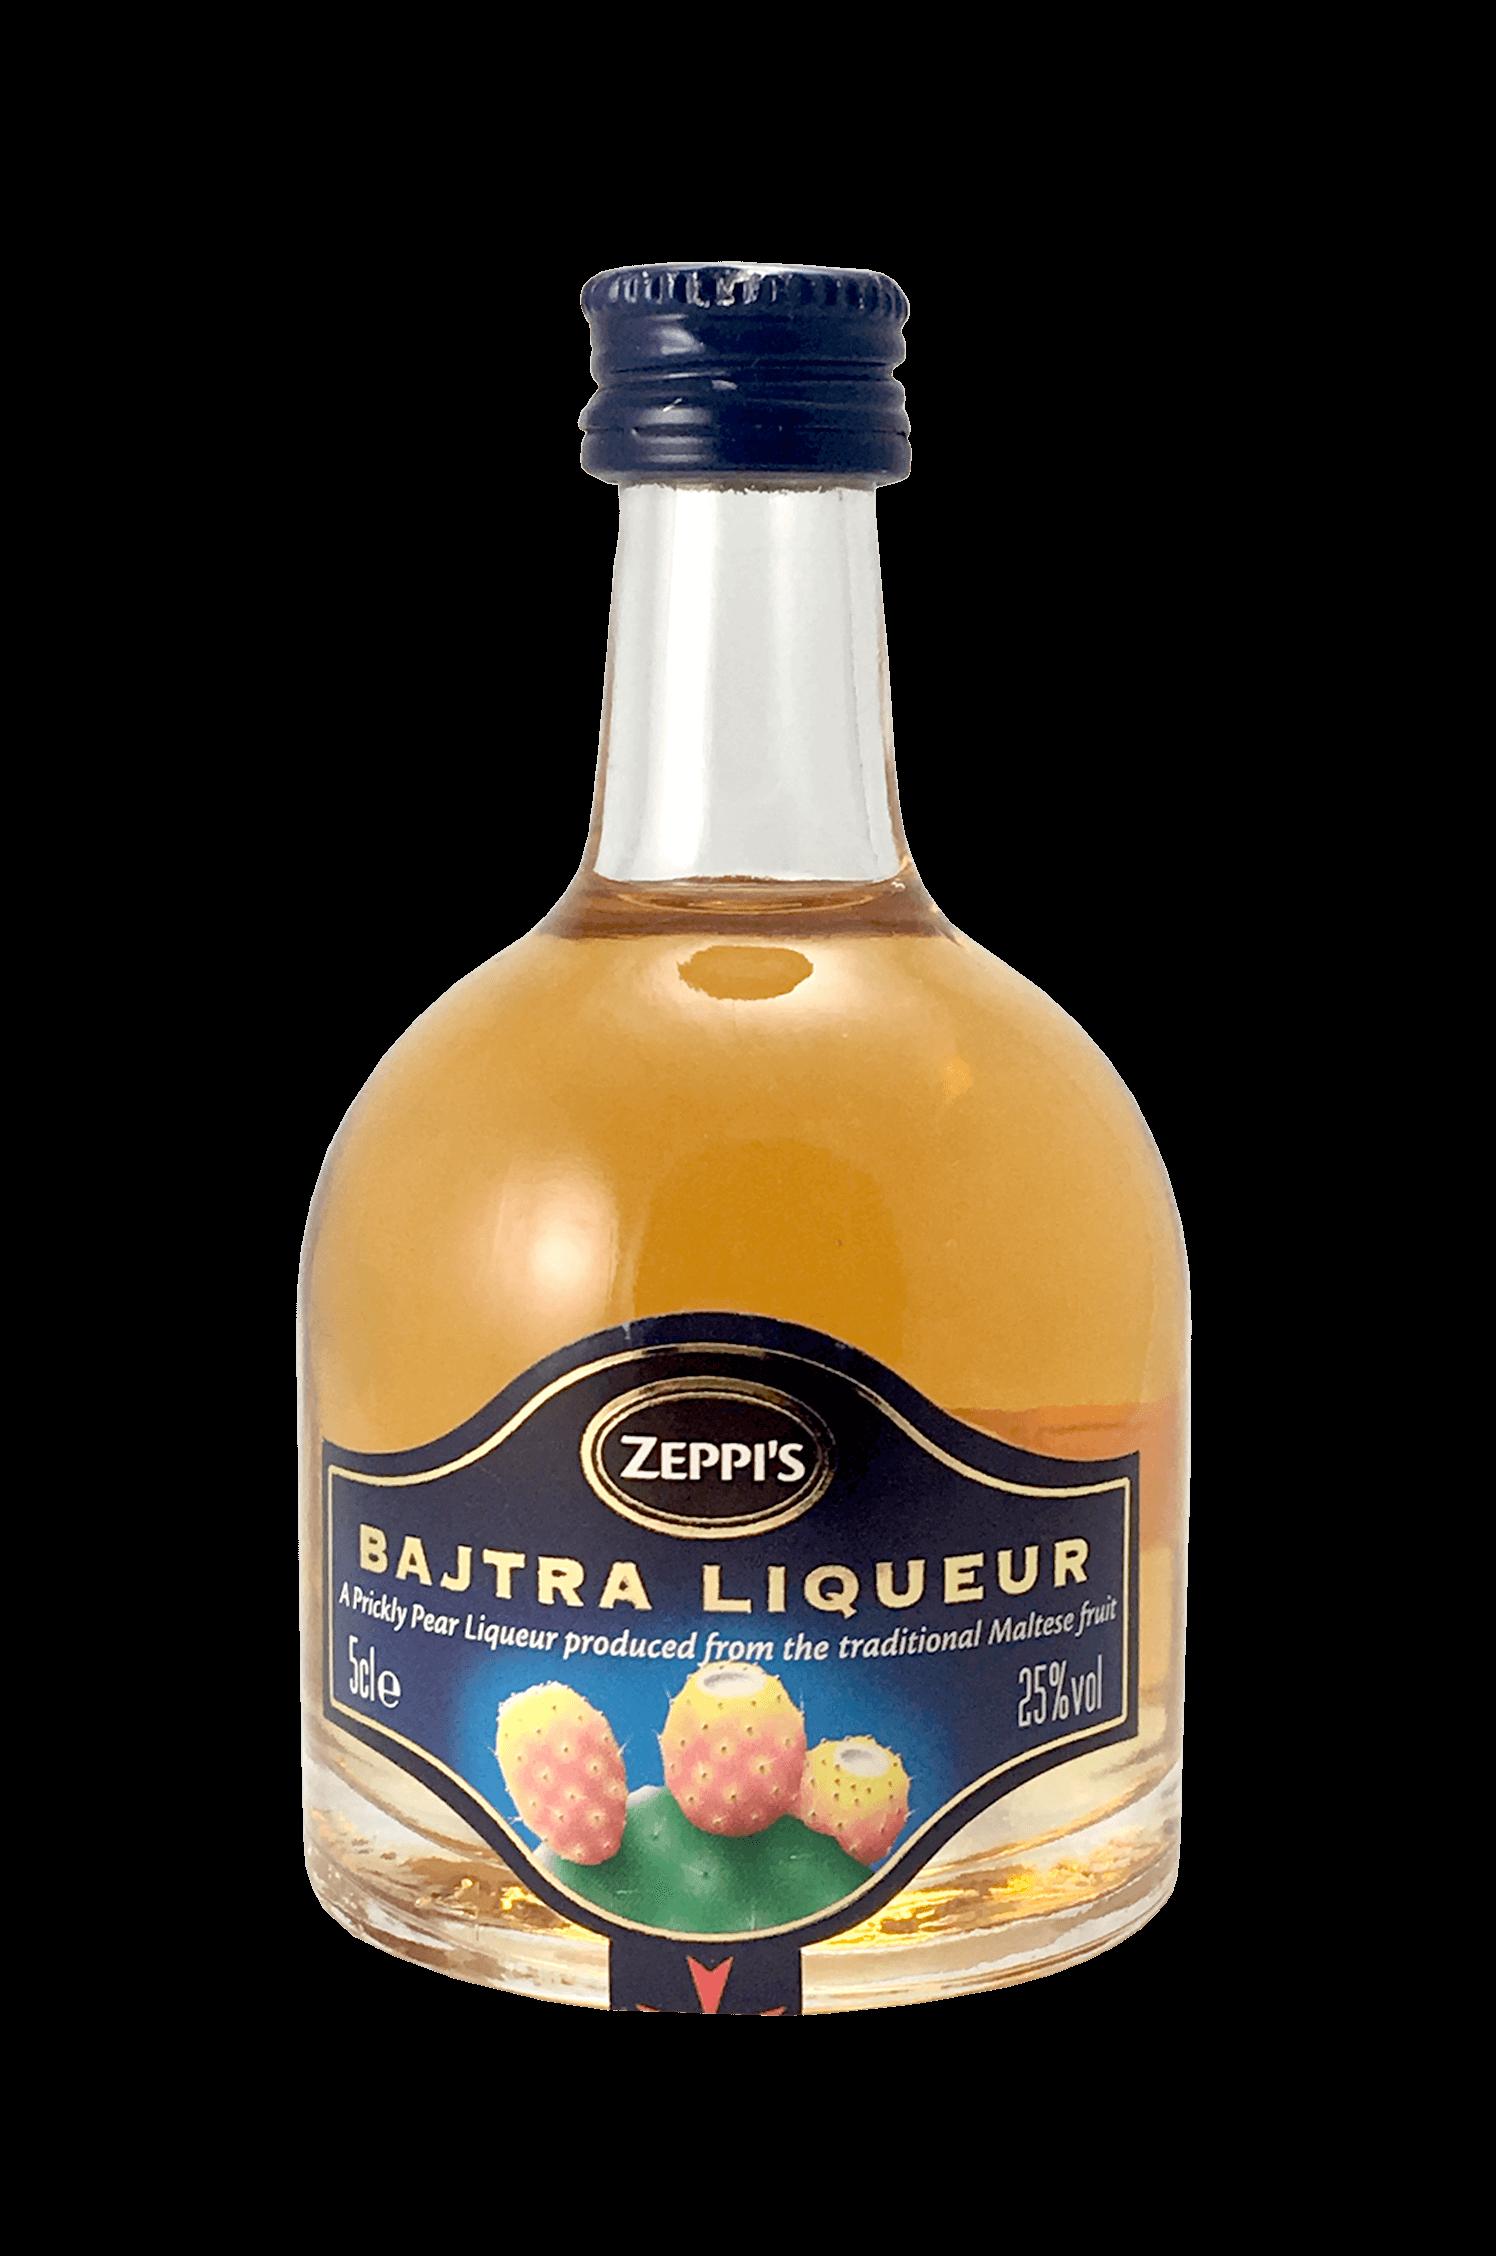 Zeppi's Bajtra Liqueur